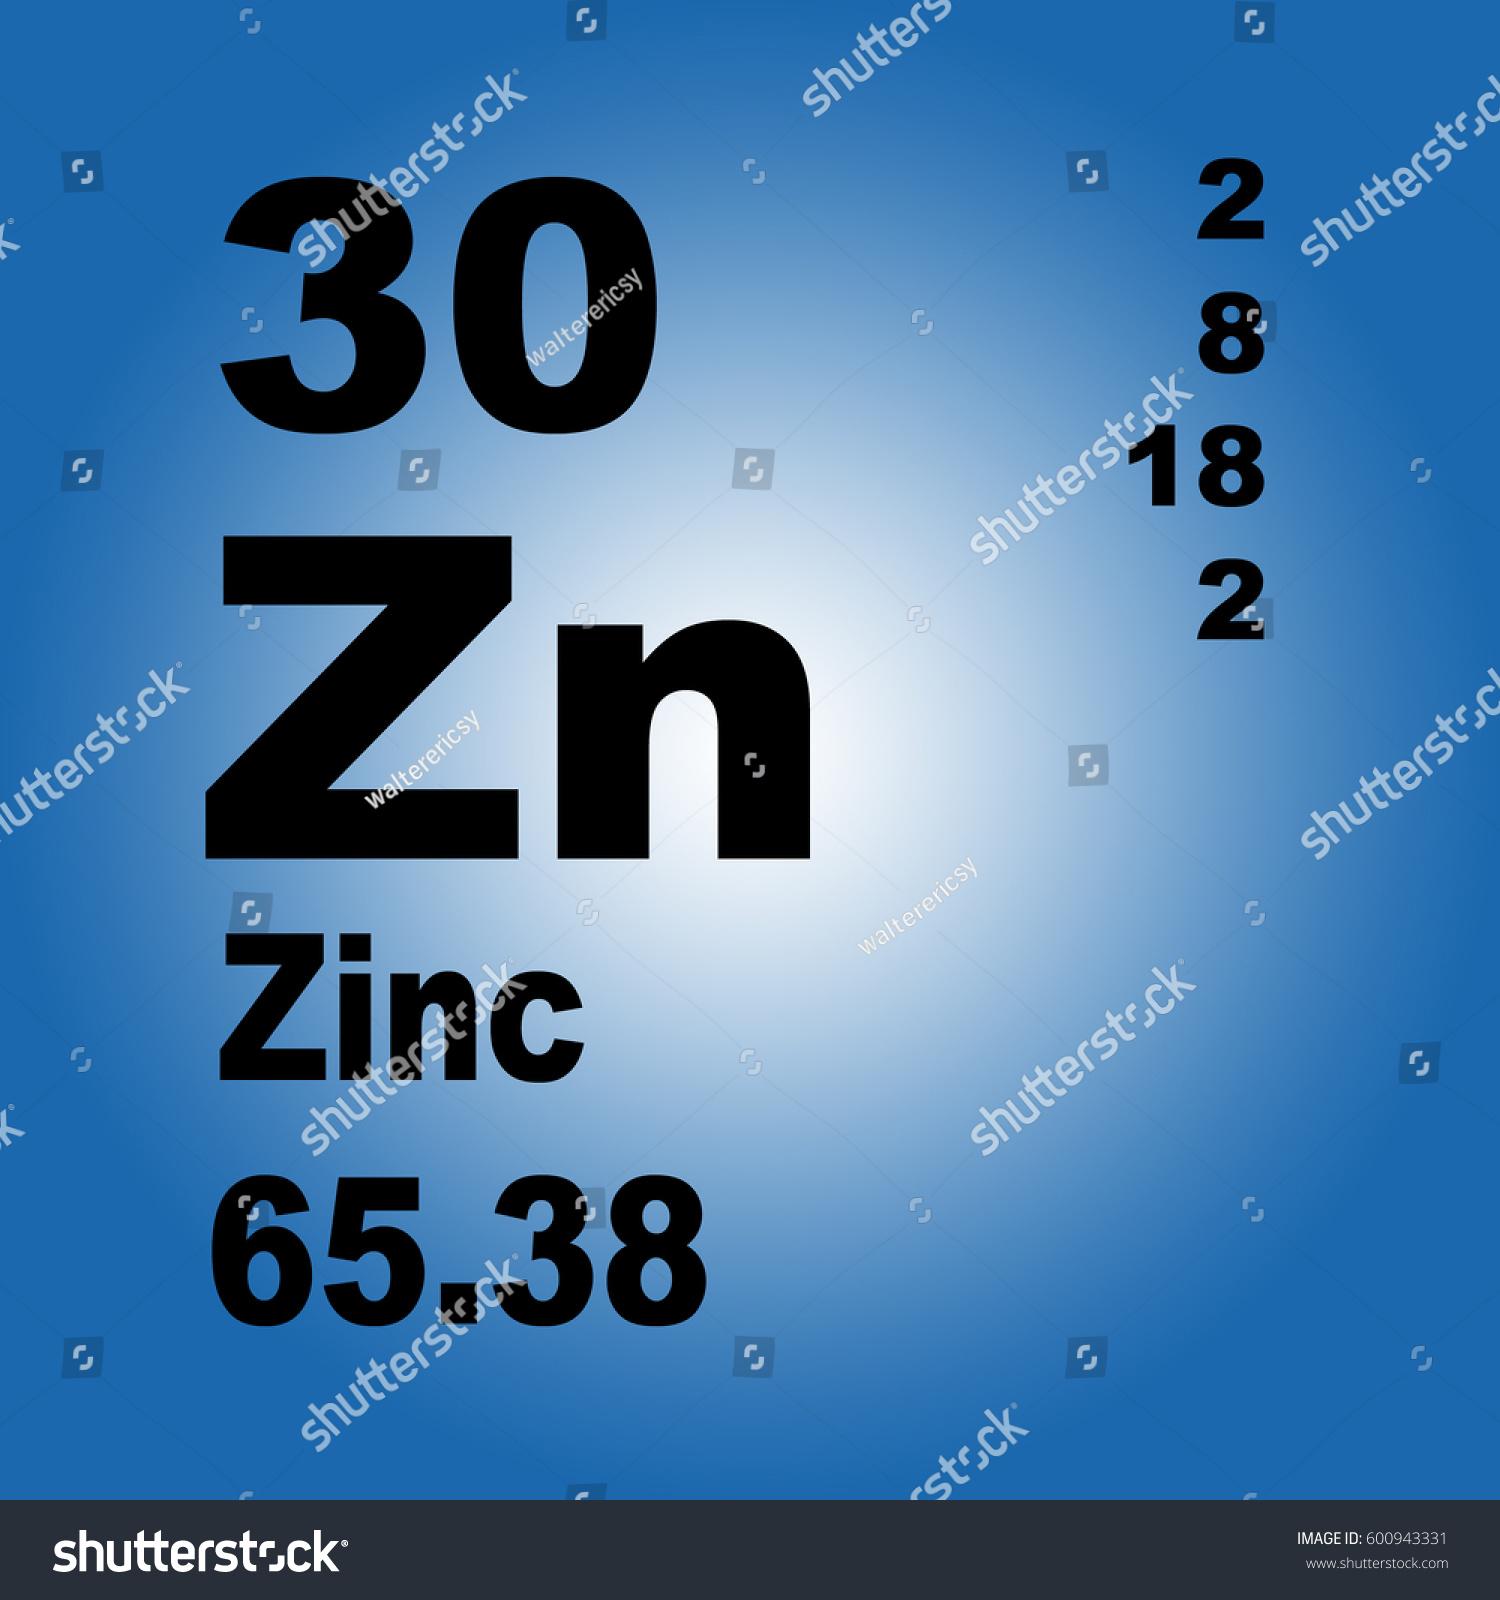 Zinc periodic table elements stock illustration 600943331 zinc periodic table of elements gamestrikefo Gallery